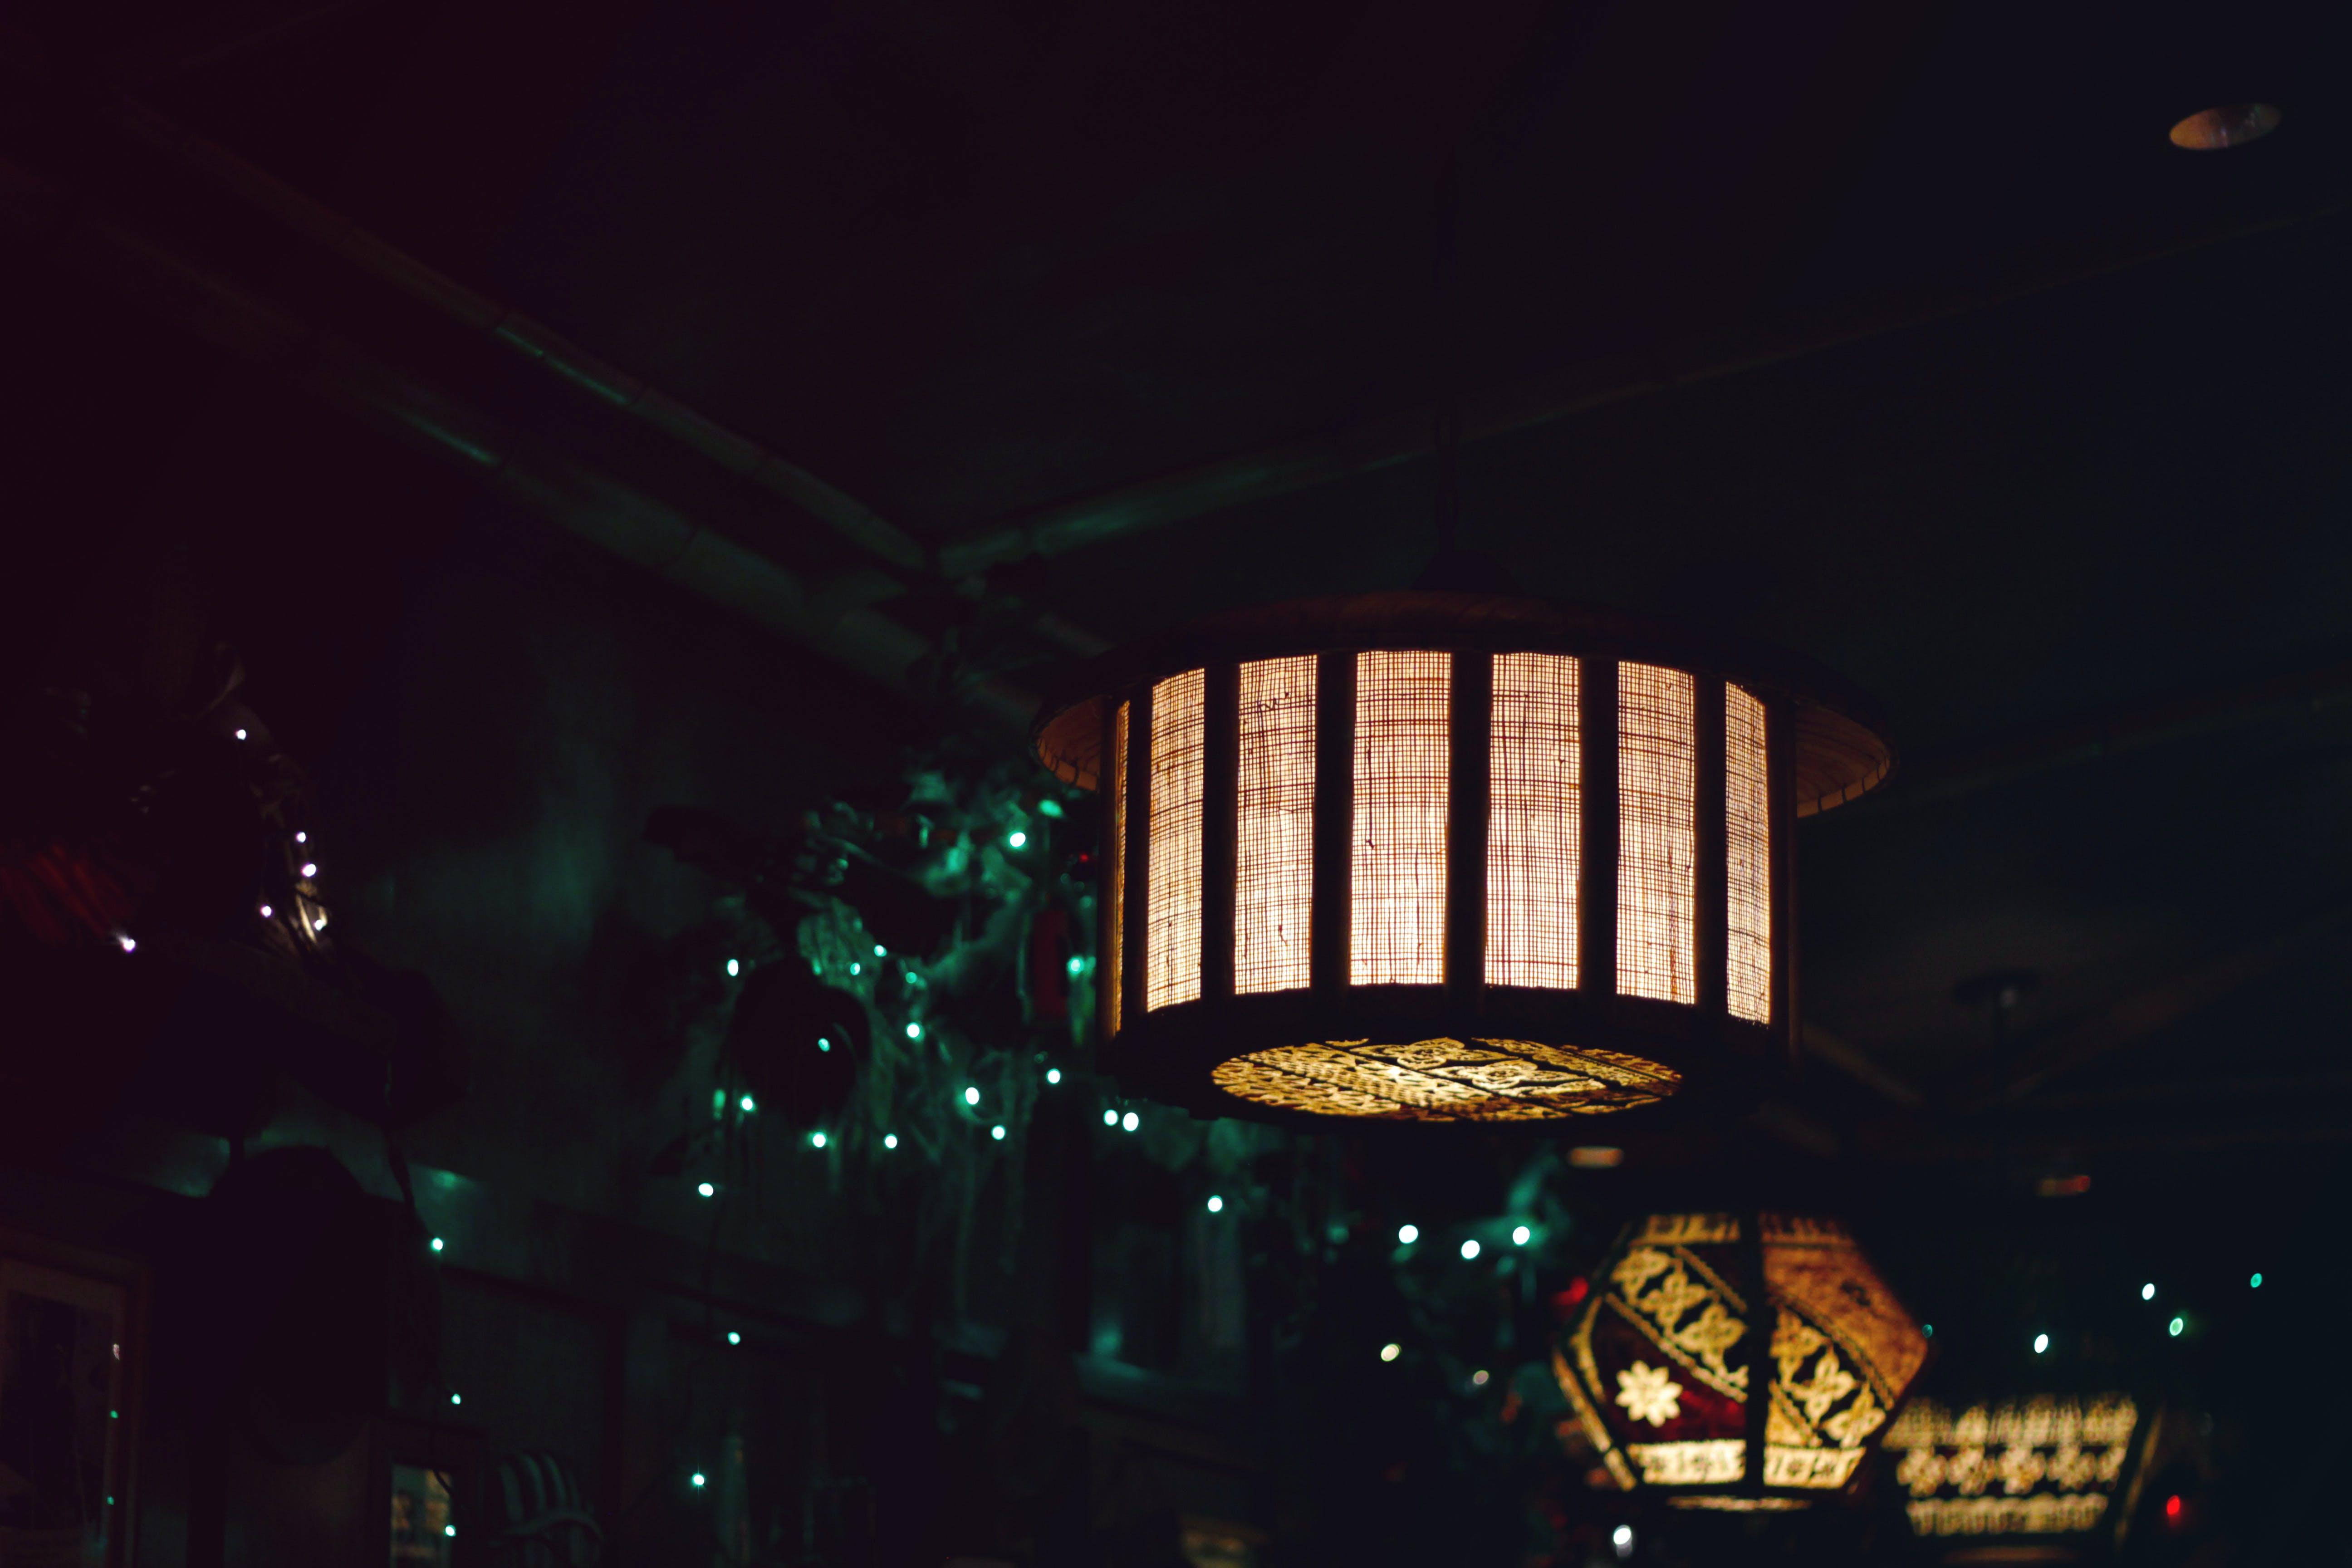 architecture, art, bar